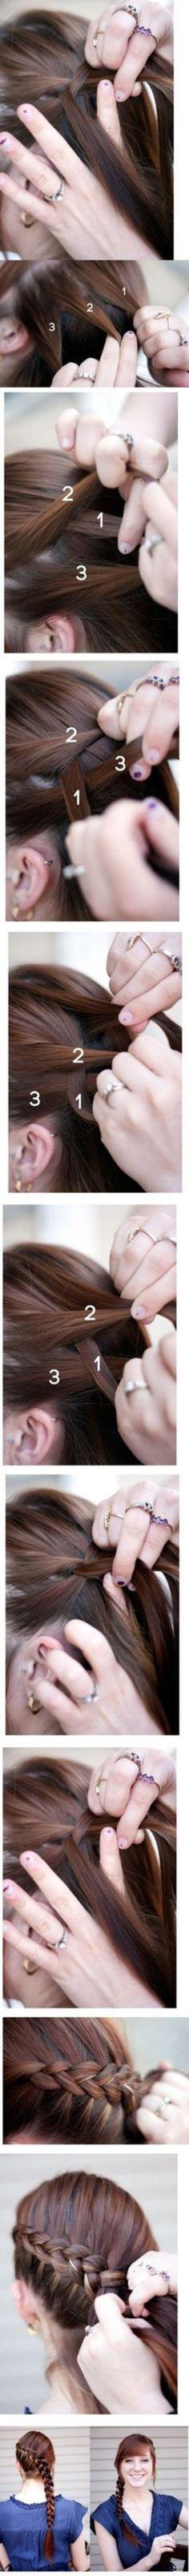 Pretty detailed step by step hair tutorial! Would ya try?!?! #tutorial #hairdo #braid #howto #stepbystep